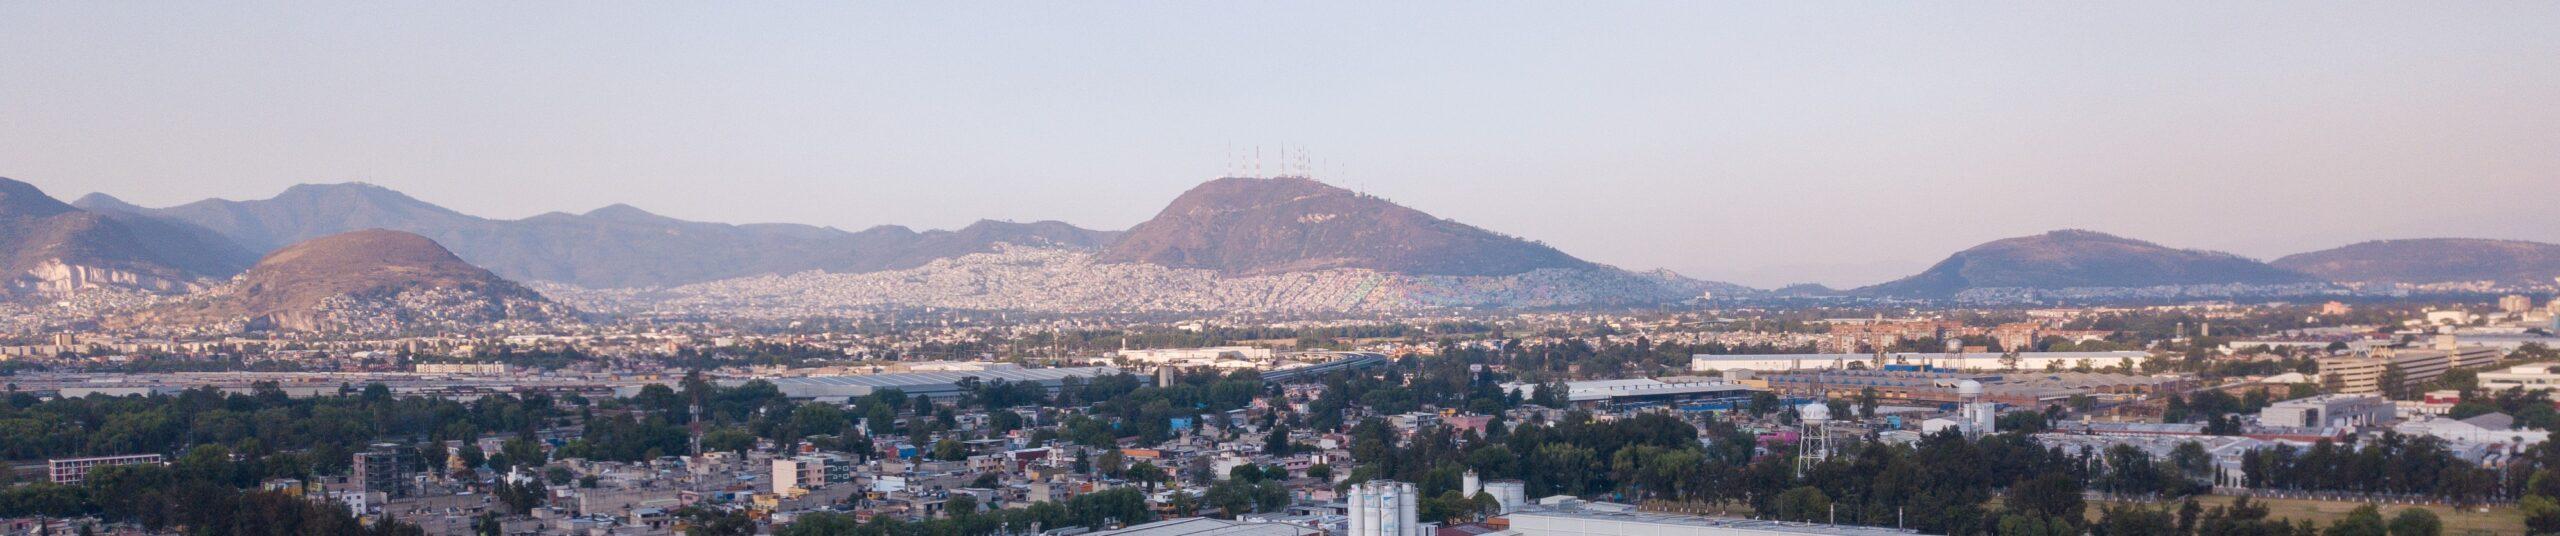 Chihuahua Ville